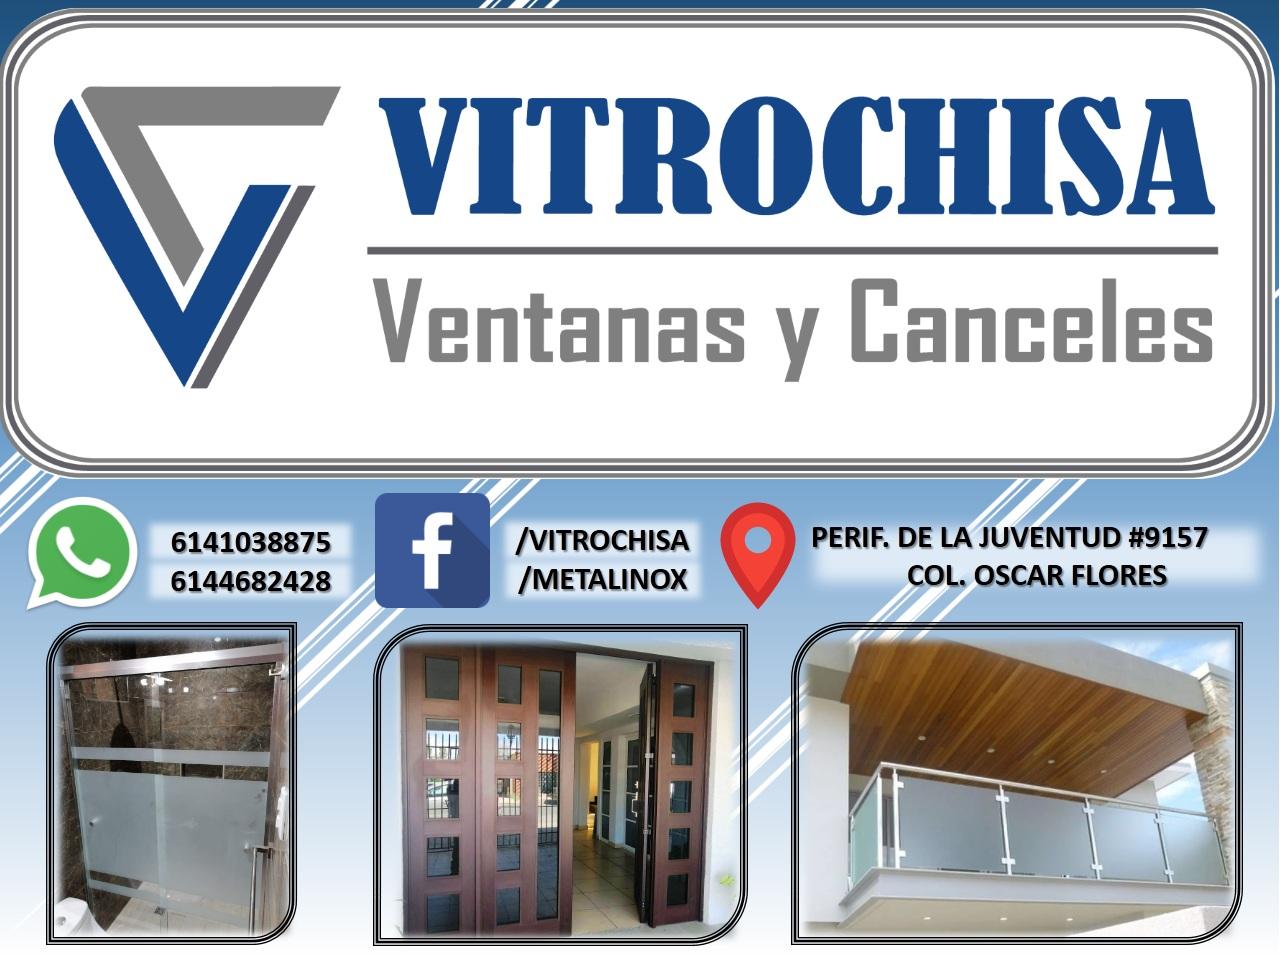 Vitrochisa, ventanas y canceles